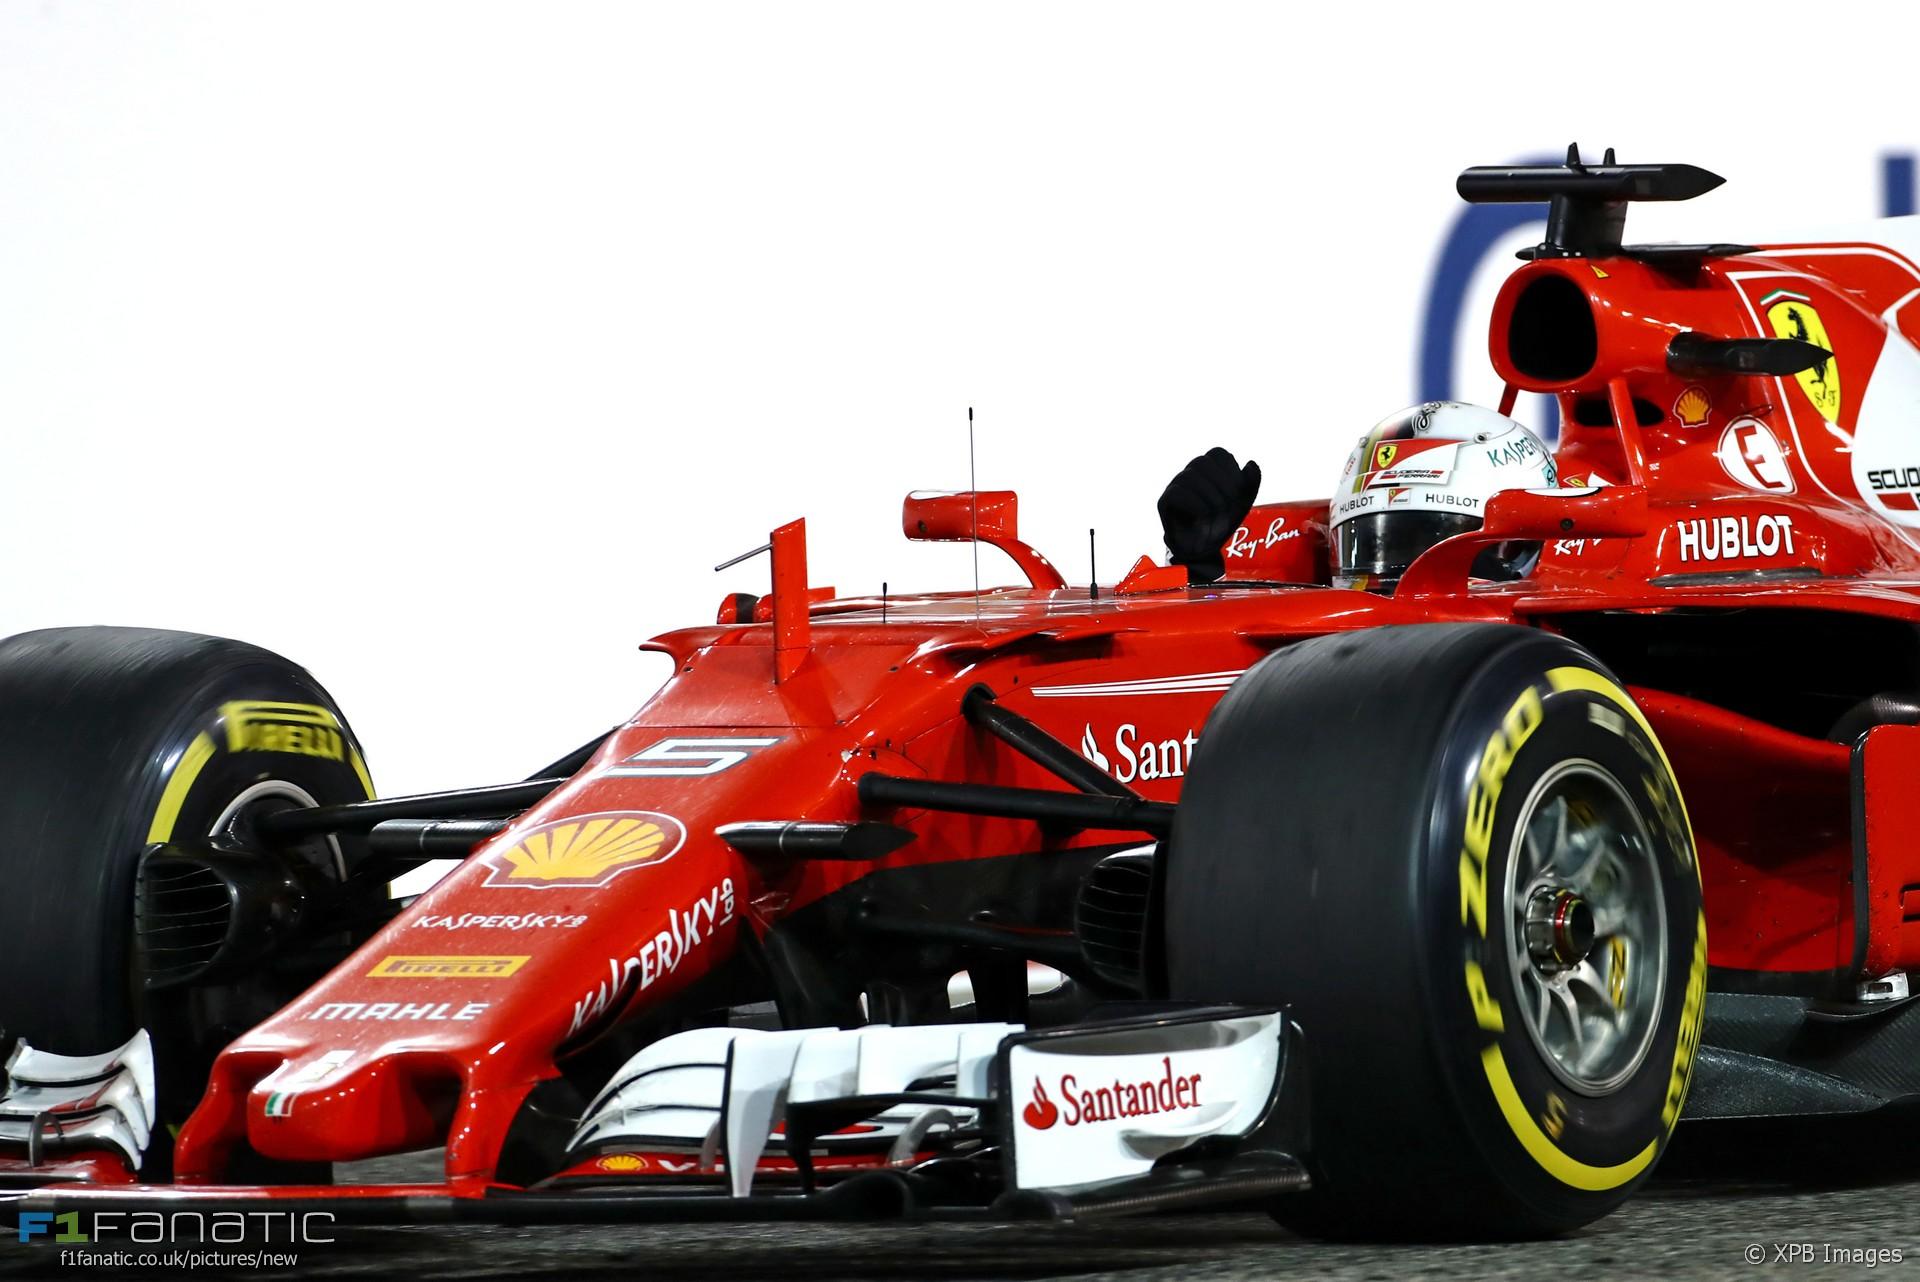 Sebastian Vettel, Ferrari, Bahrain International Circuit, 2017